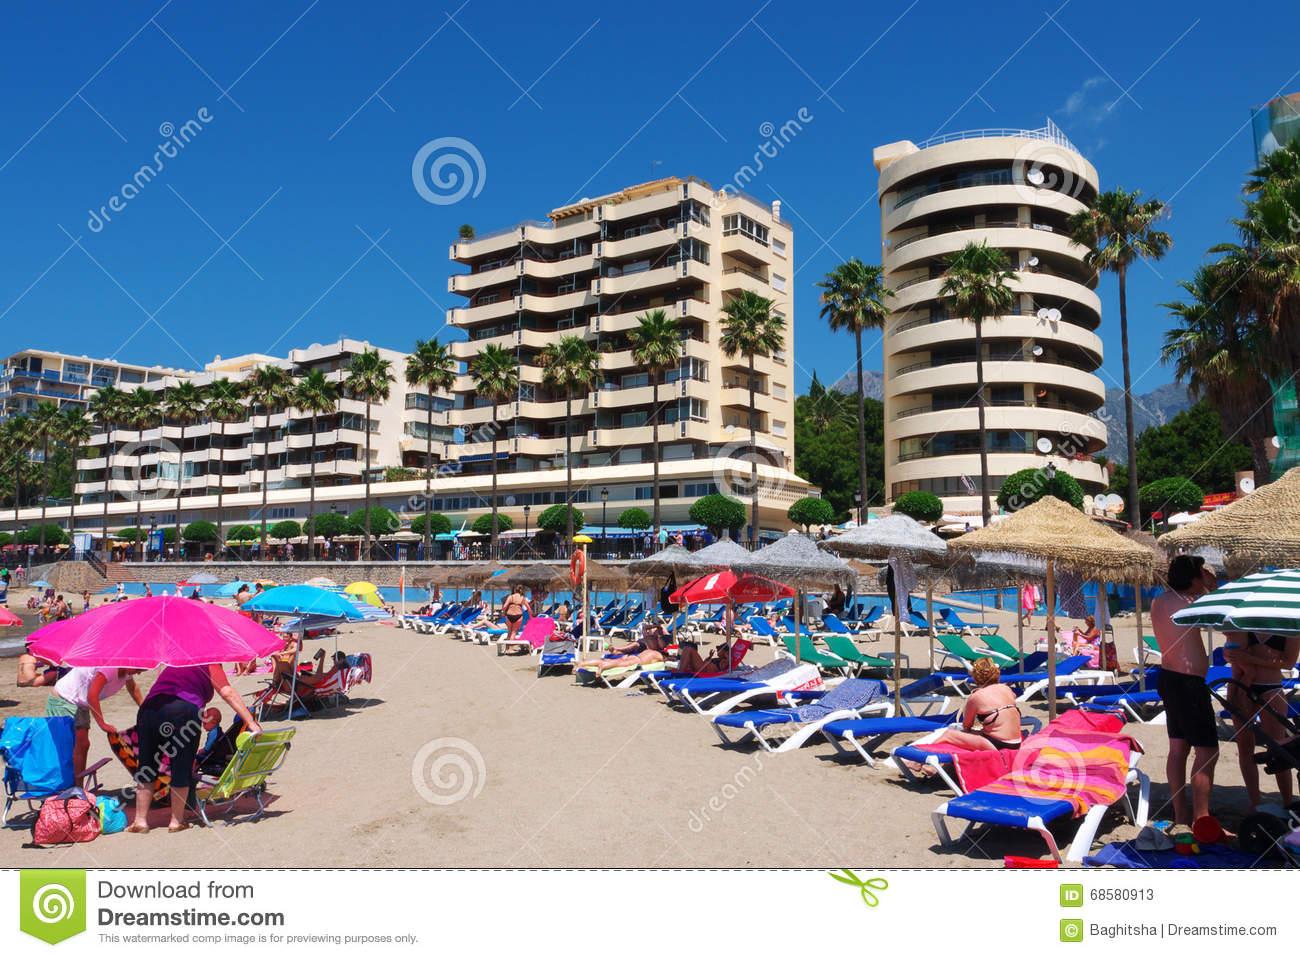 vacances plage espagne appartement espagne bord de mer experience voyage. Black Bedroom Furniture Sets. Home Design Ideas